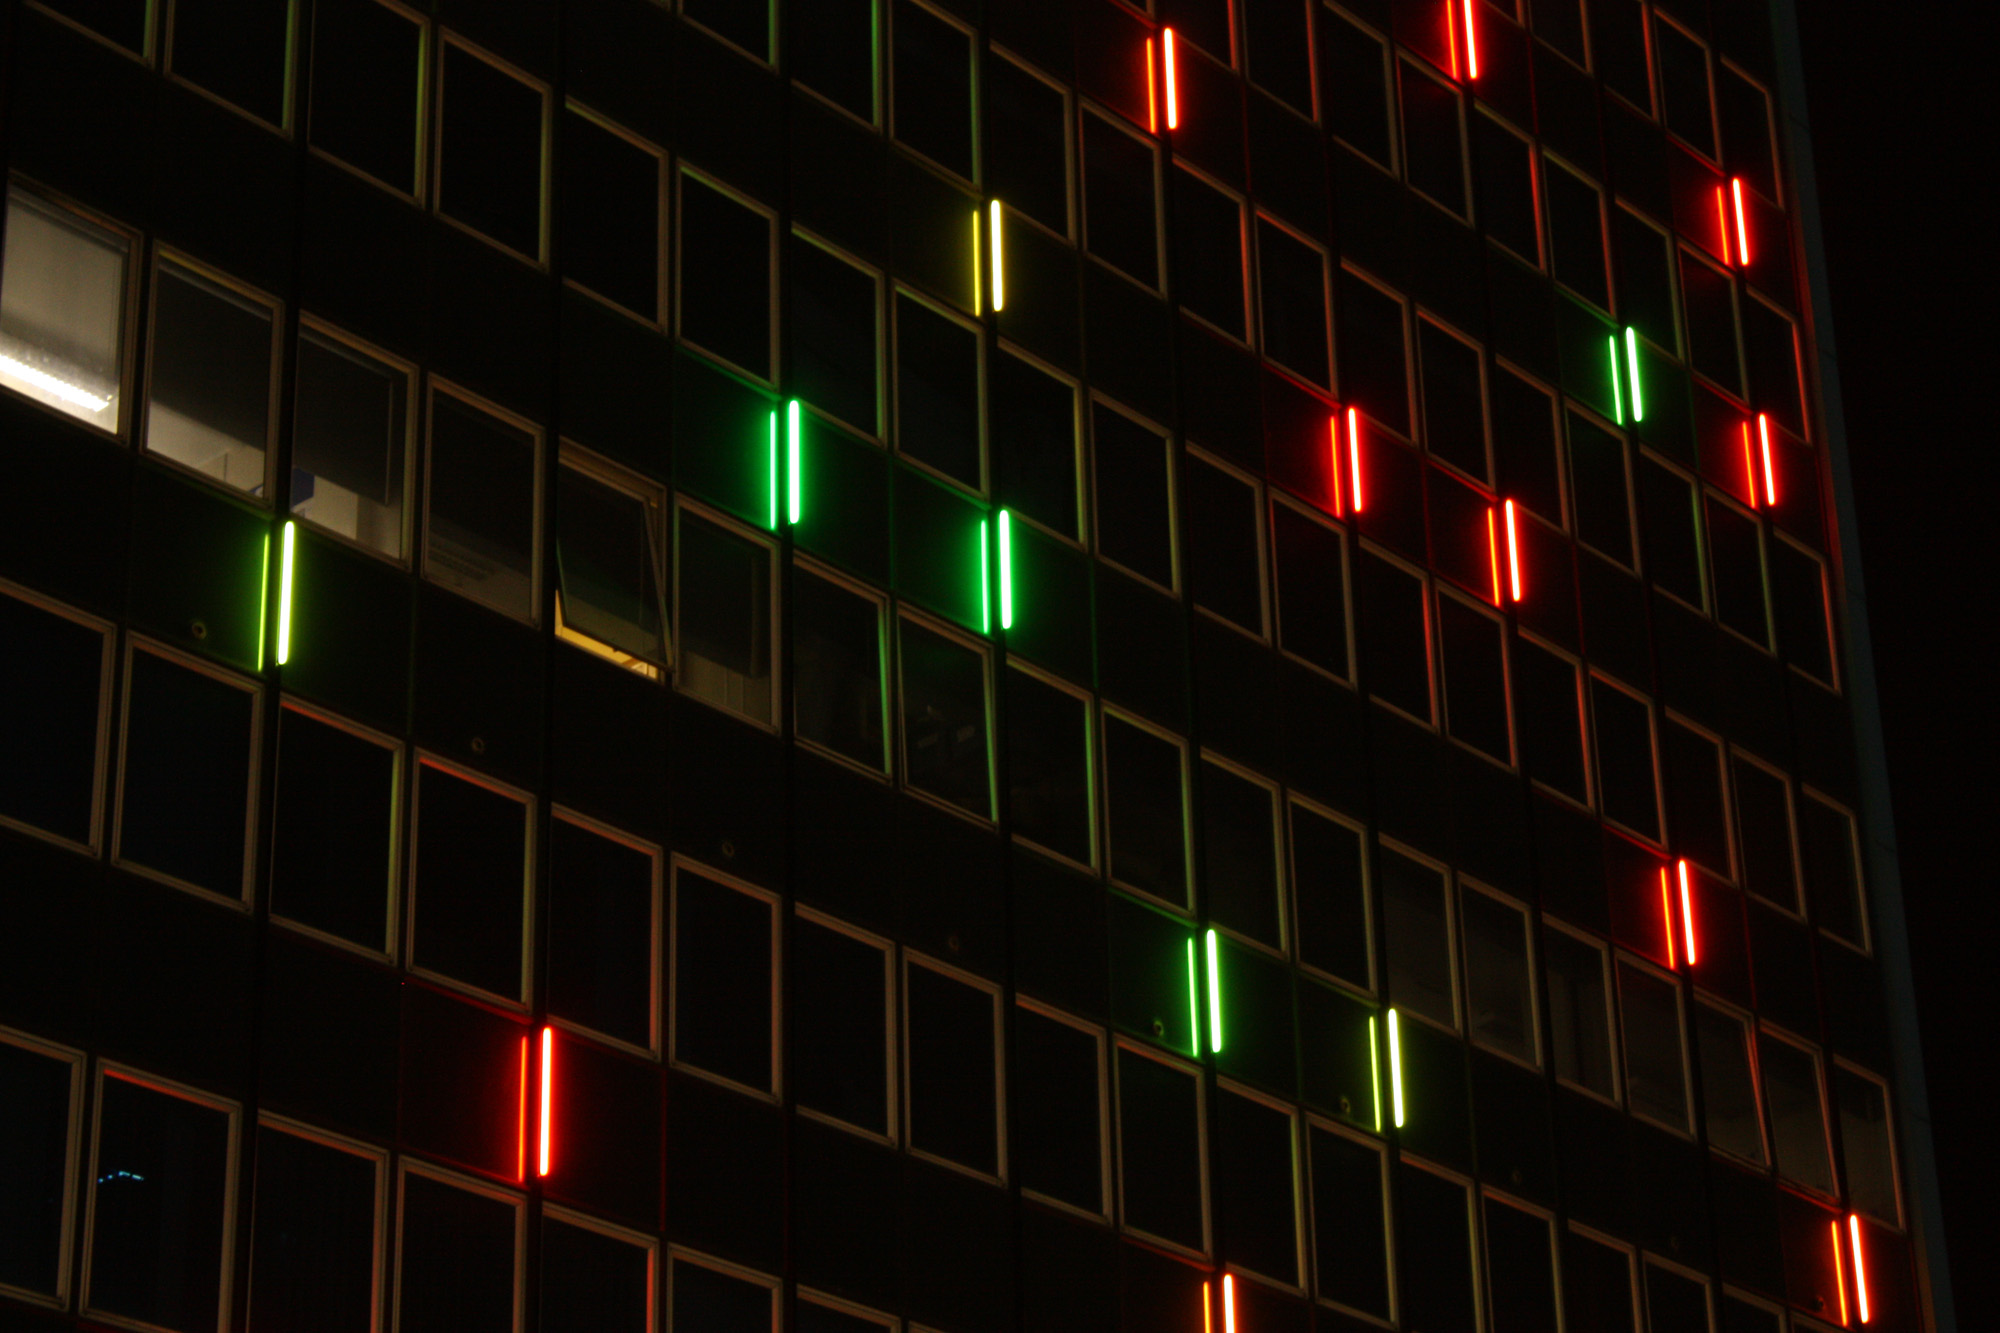 International house bespoke lighting manufacture image for International housse